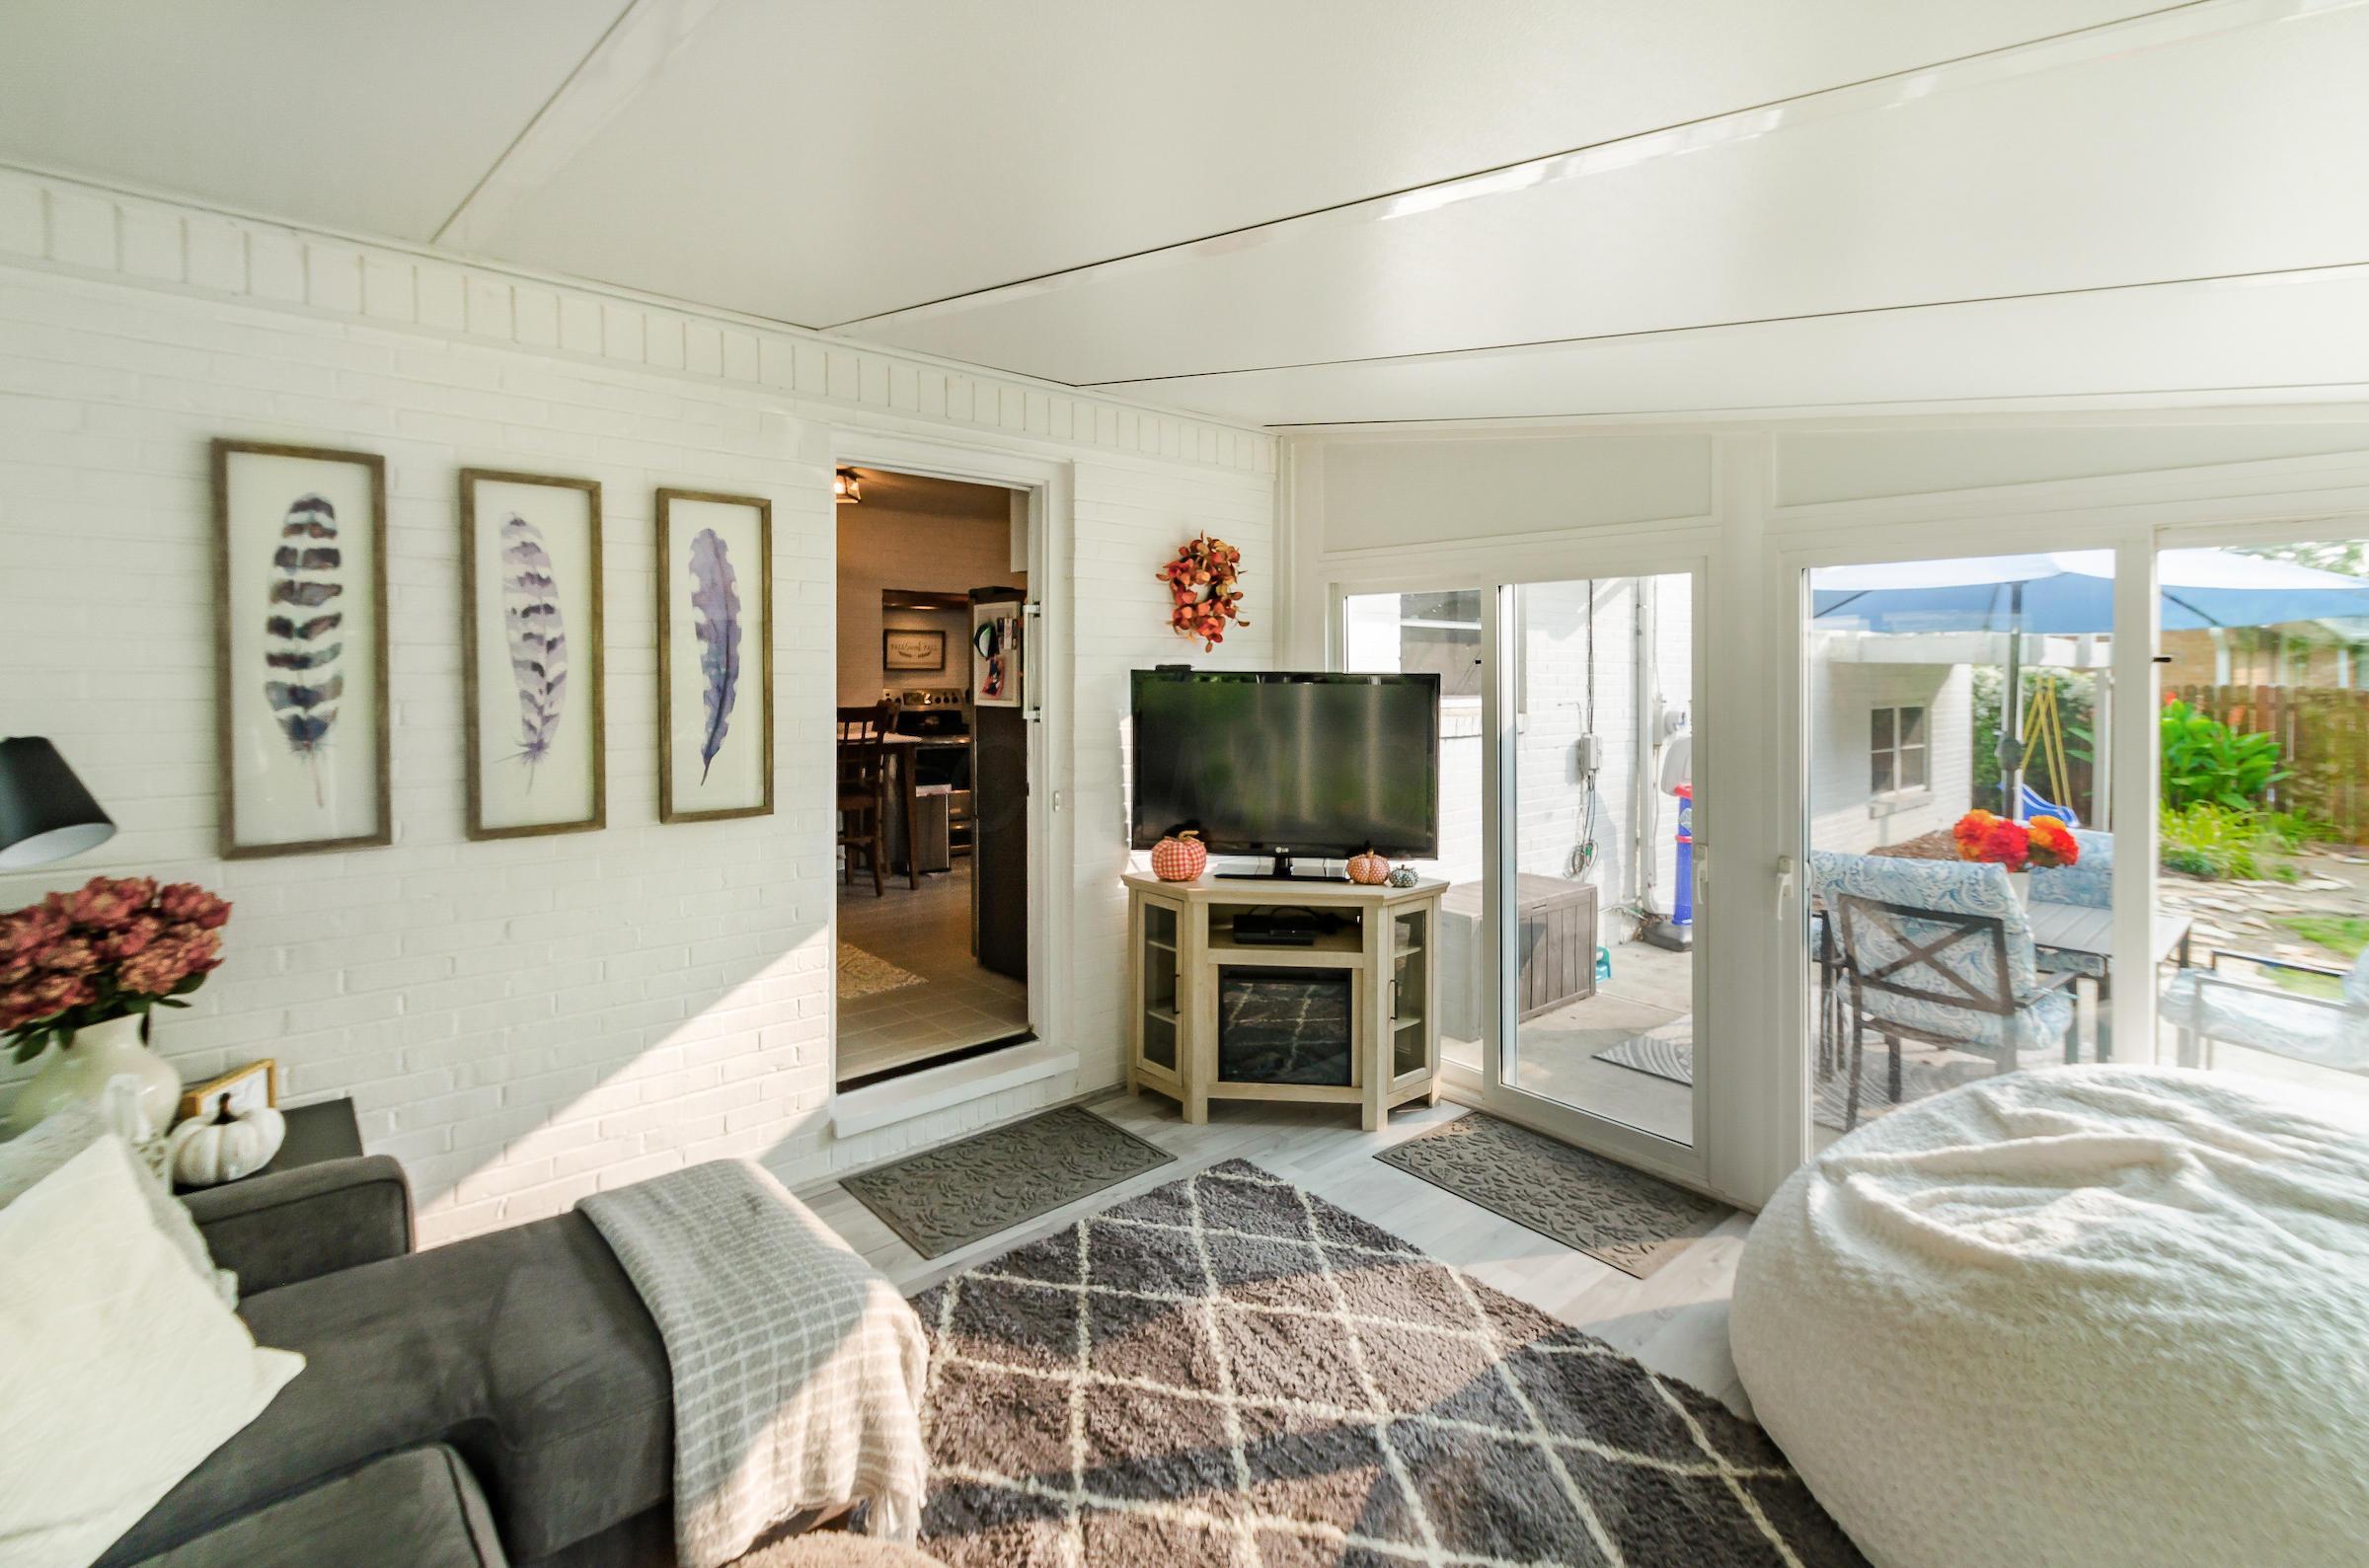 3511 Darbyshire Drive, Hilliard, Ohio 43026, 3 Bedrooms Bedrooms, ,3 BathroomsBathrooms,Residential,For Sale,Darbyshire,220032305